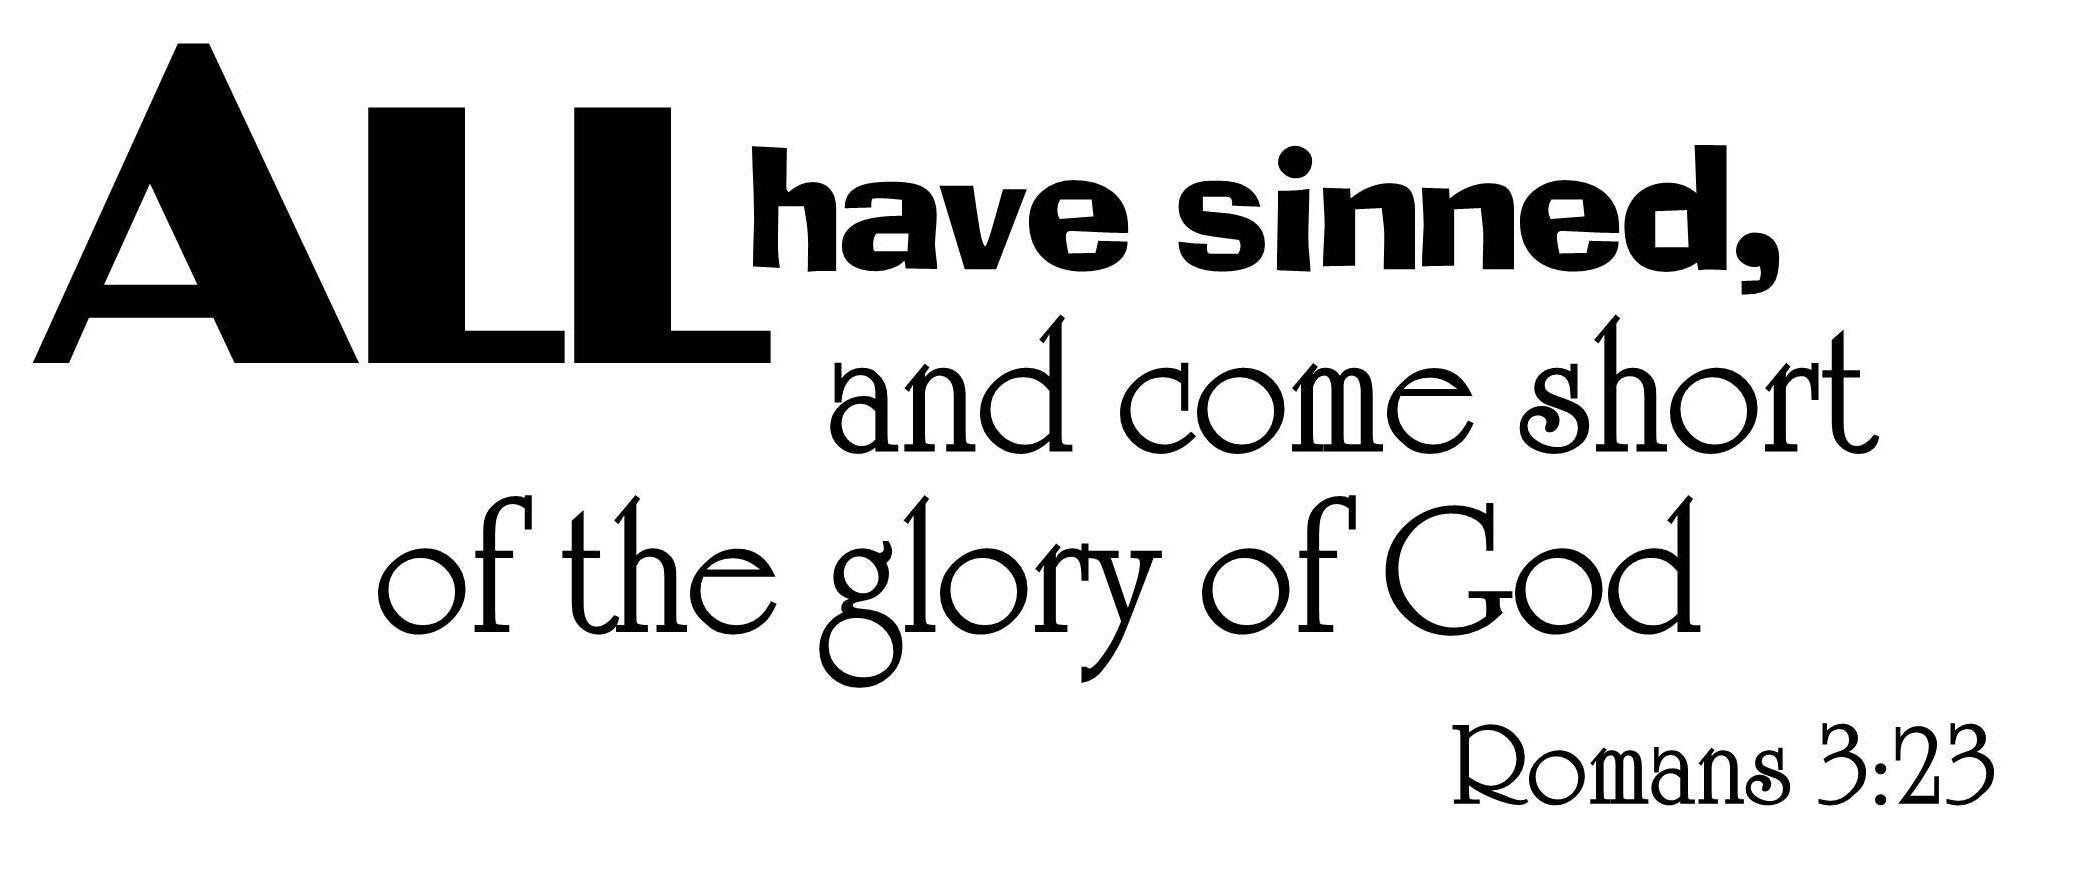 Romans 3:23